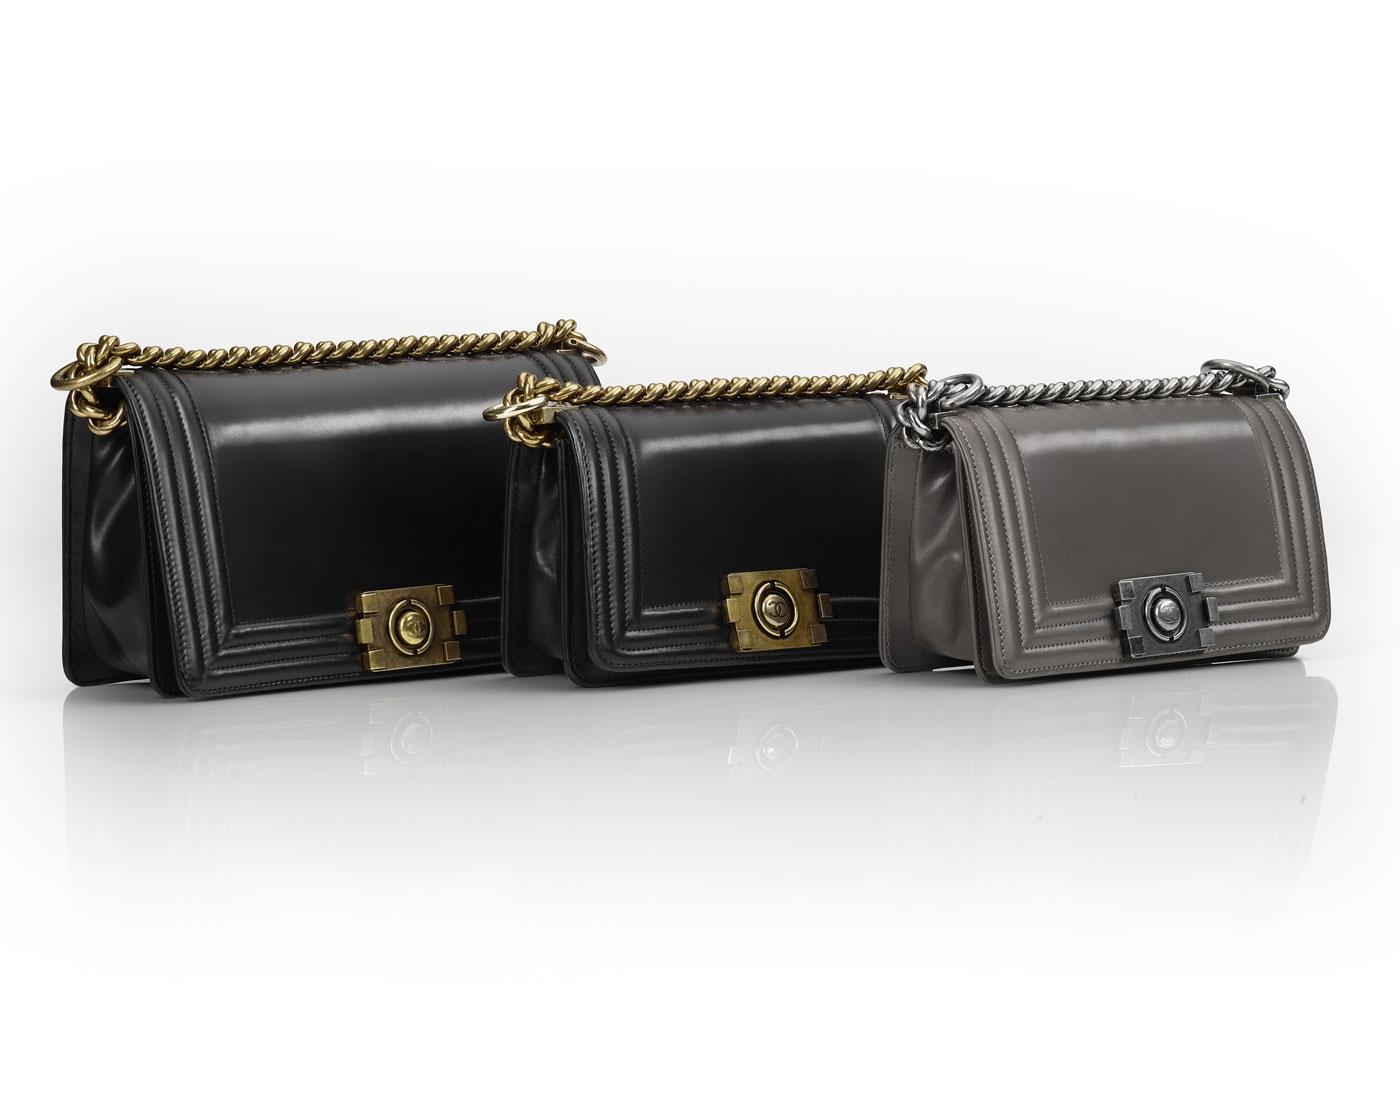 9fb095b85b70 Chanel Boy Bag Collection Fall 2011